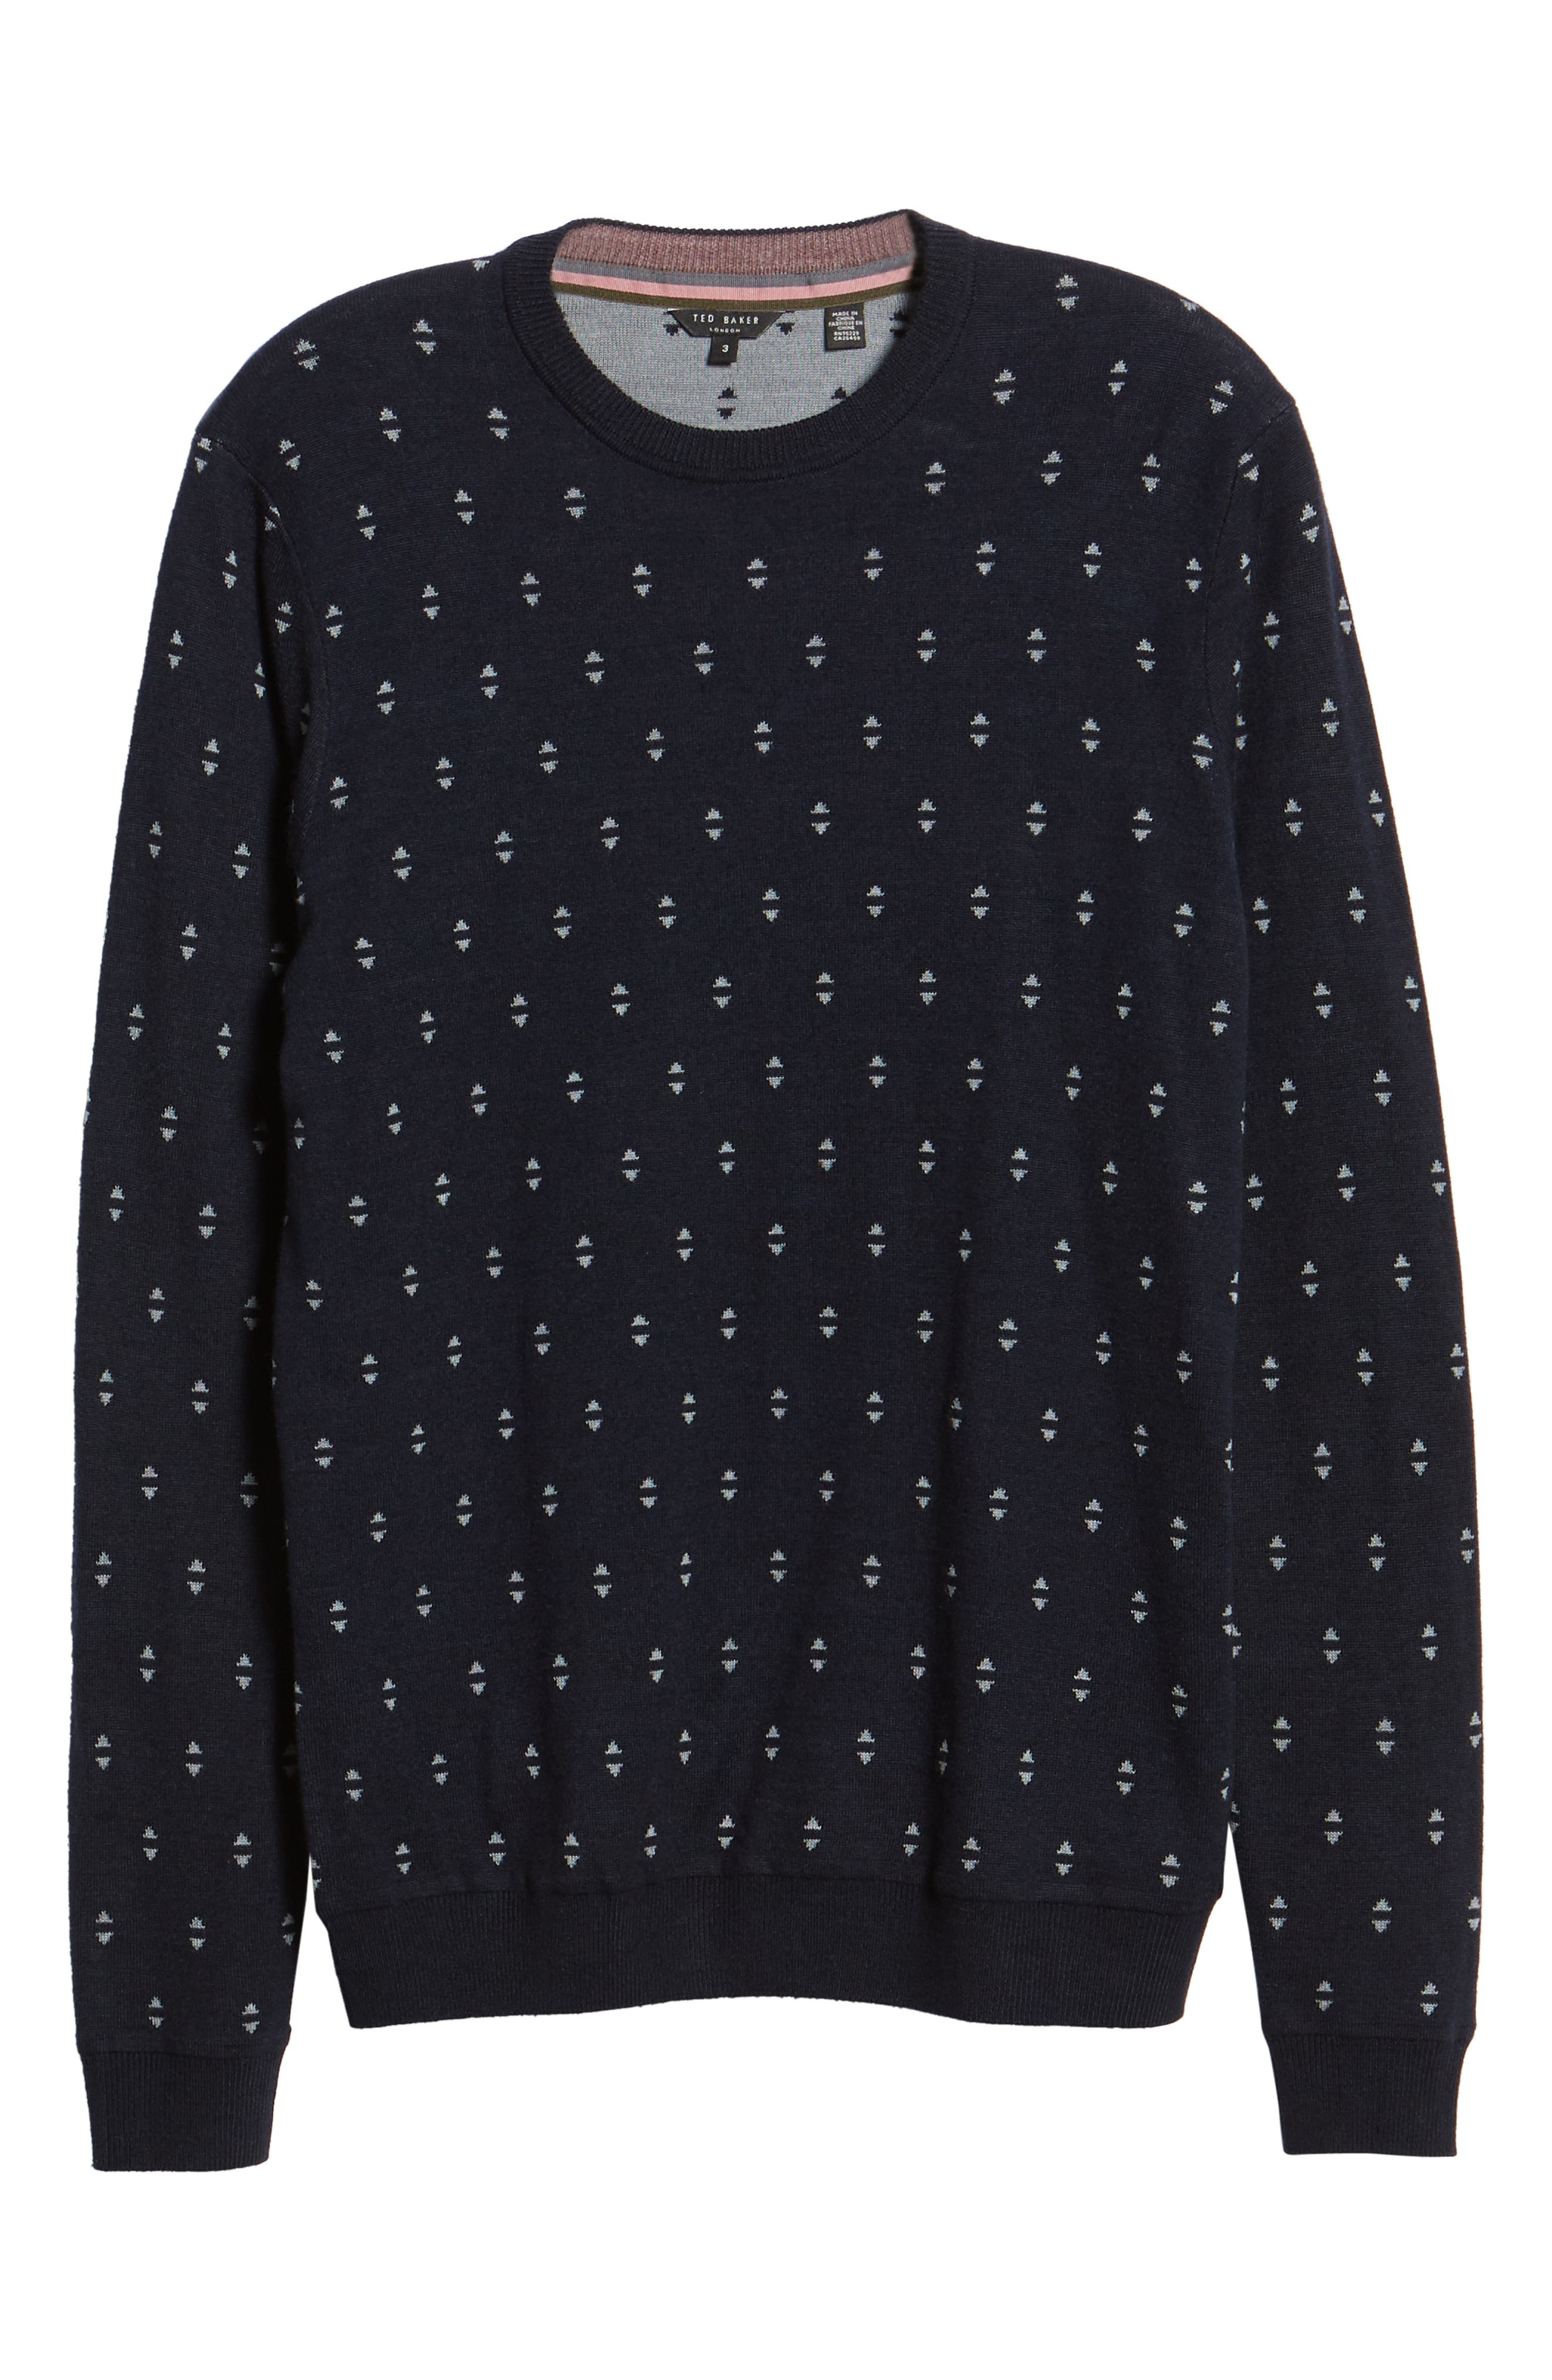 Talkoo Trim Fit Crewneck Sweater,                             Alternate thumbnail 6, color,                             410